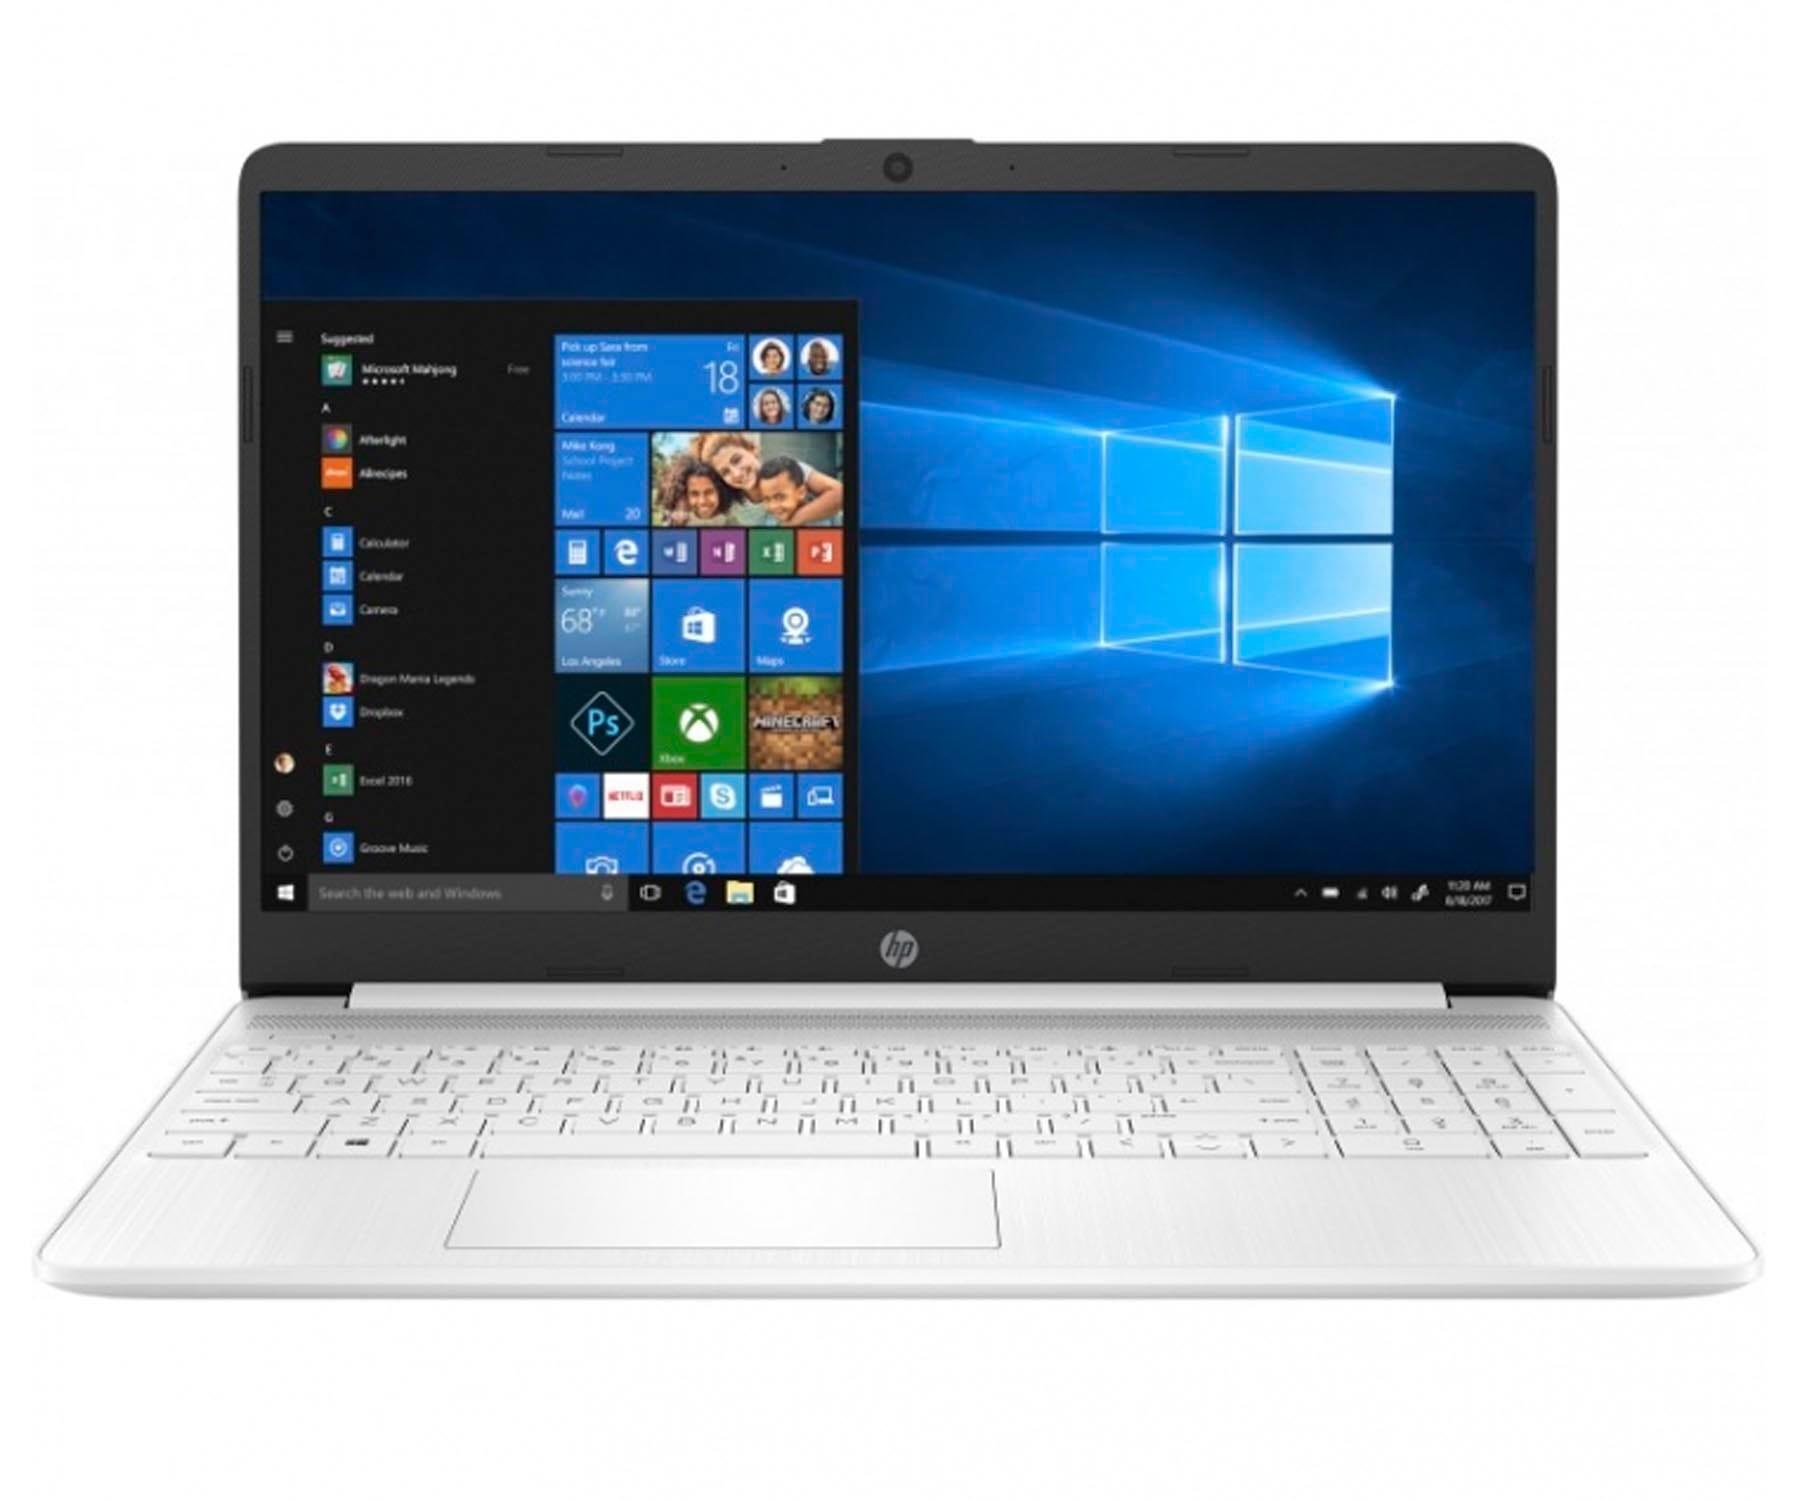 HP ENVY X360 15s-FQ1031 BLANCO PORTÁTIL 15.6'' HD i5-1035G1 1TB SSD 8GB RAM WINDOWS 10 HOME